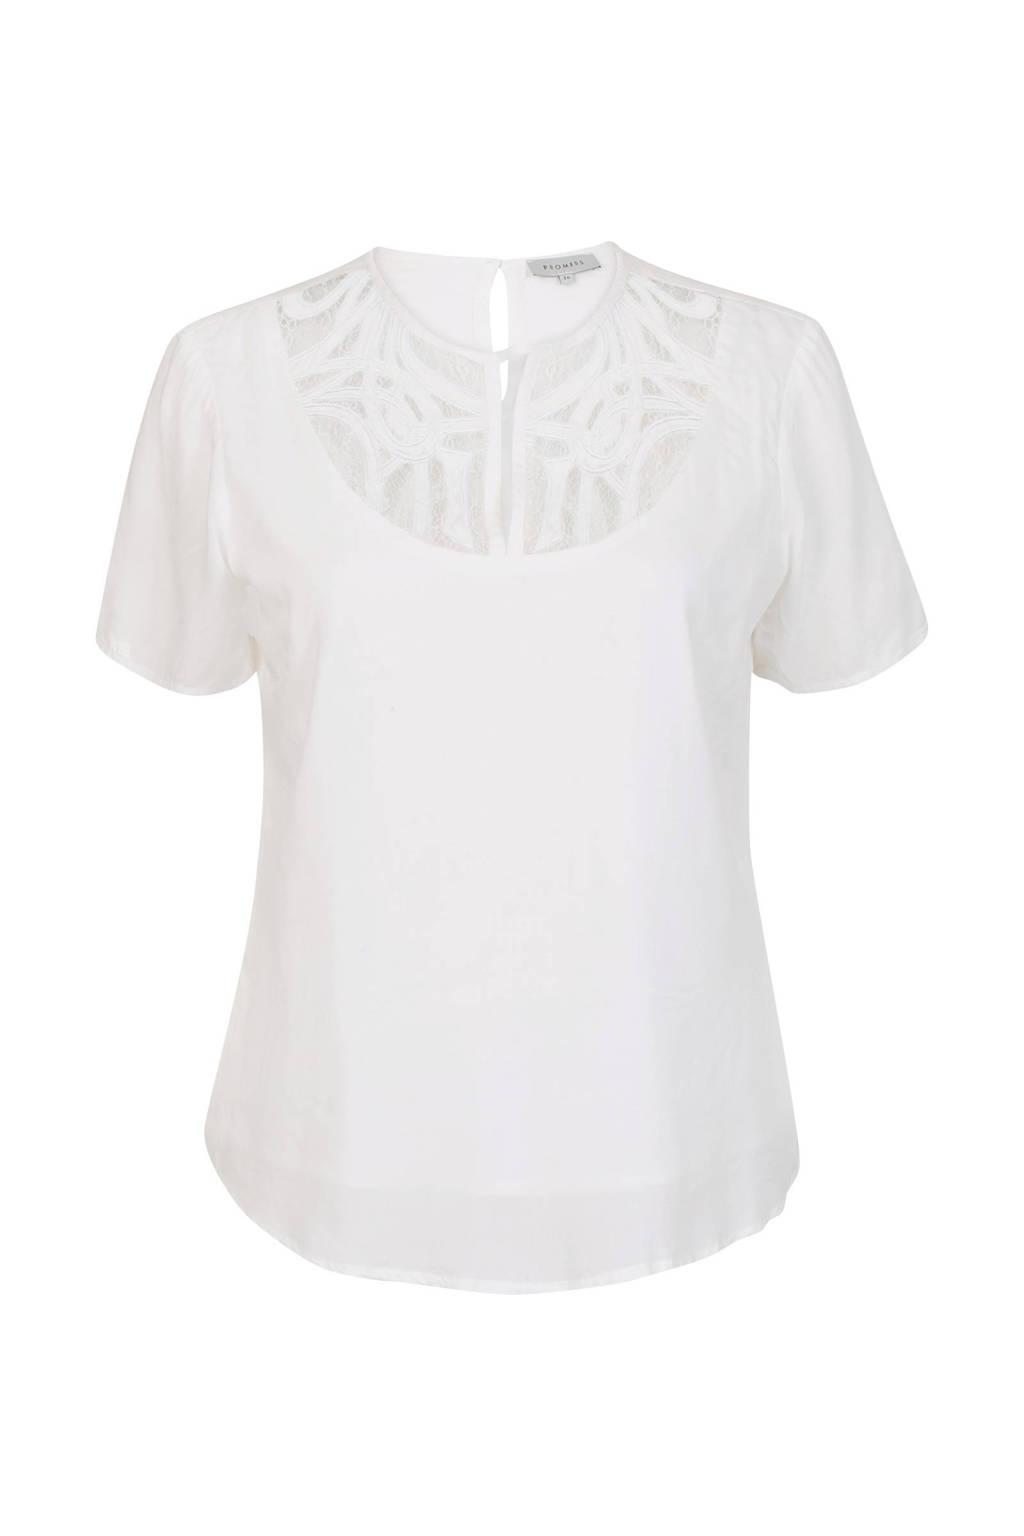 PROMISS top met kant wit, Wit